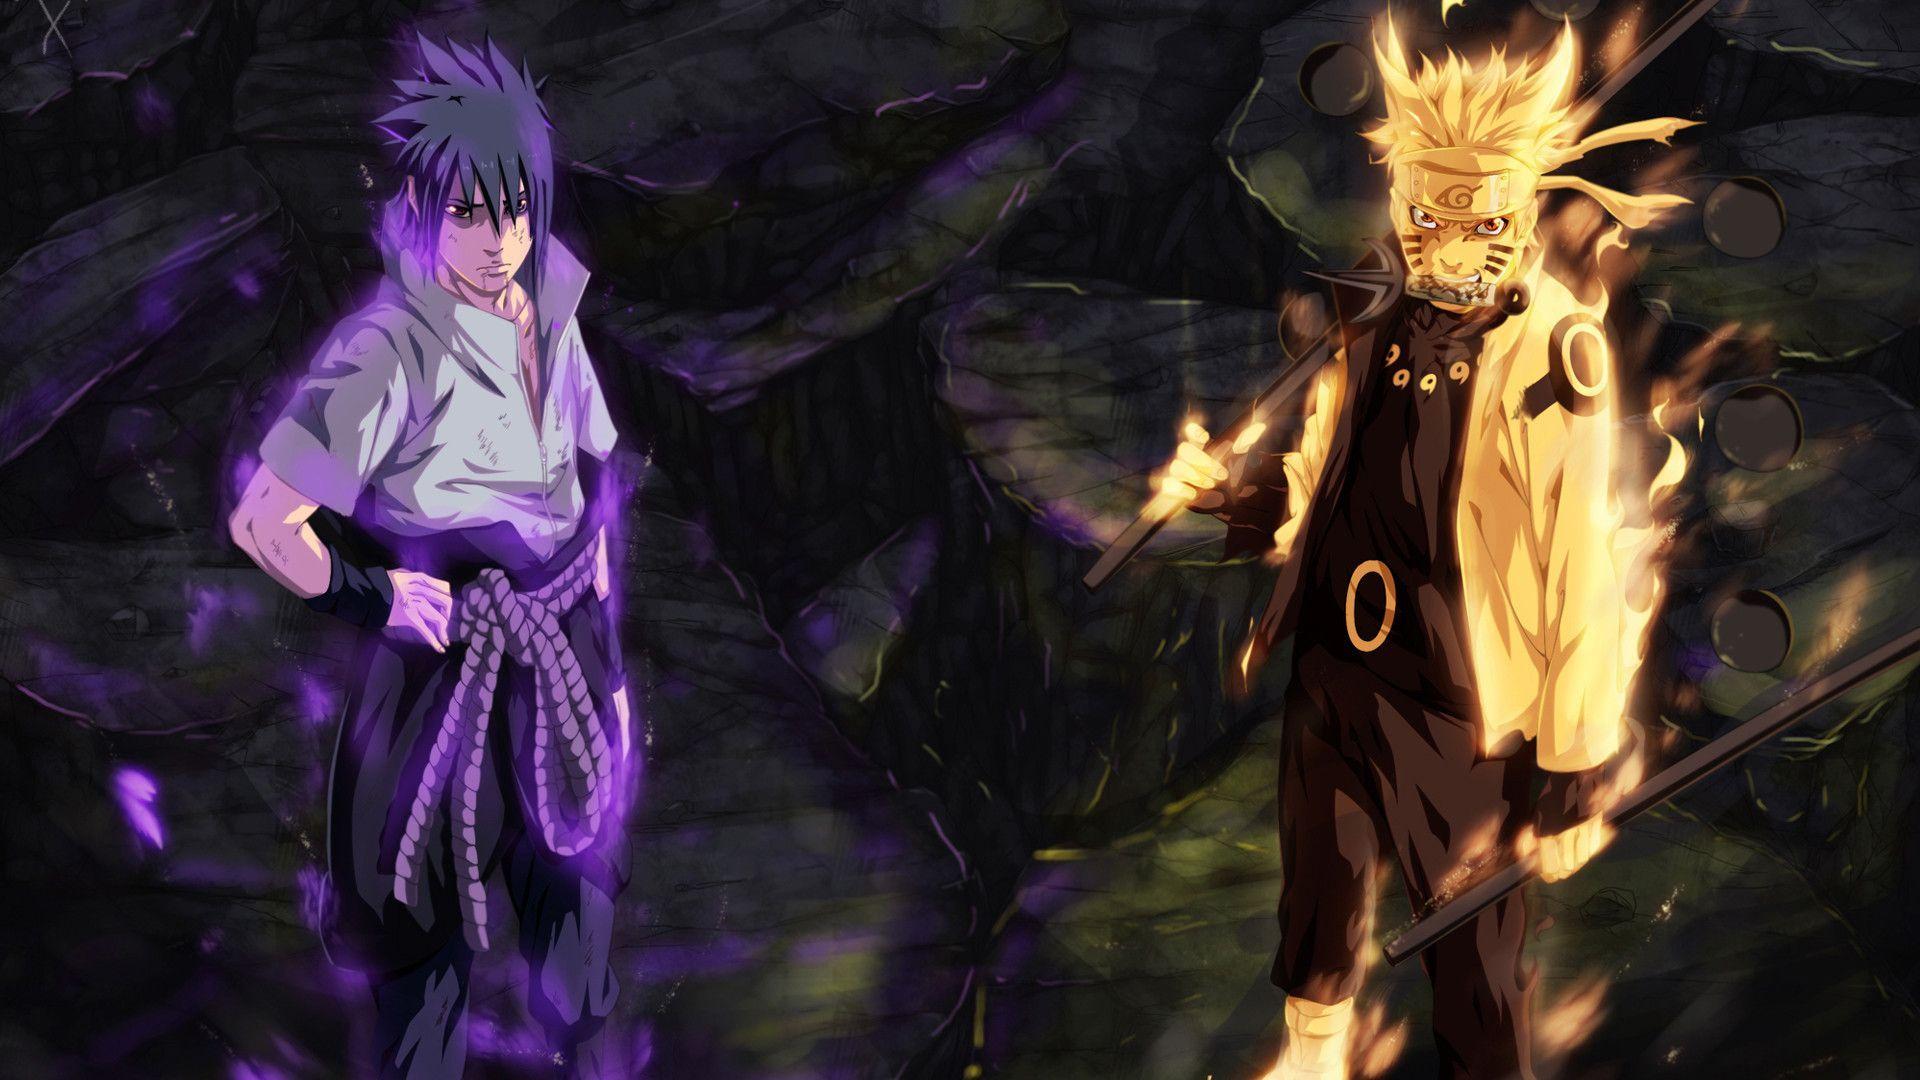 1920x1080 Naruto Vs Sasuke Wallpaper 57 Images Saske Anime Personagens De Anime